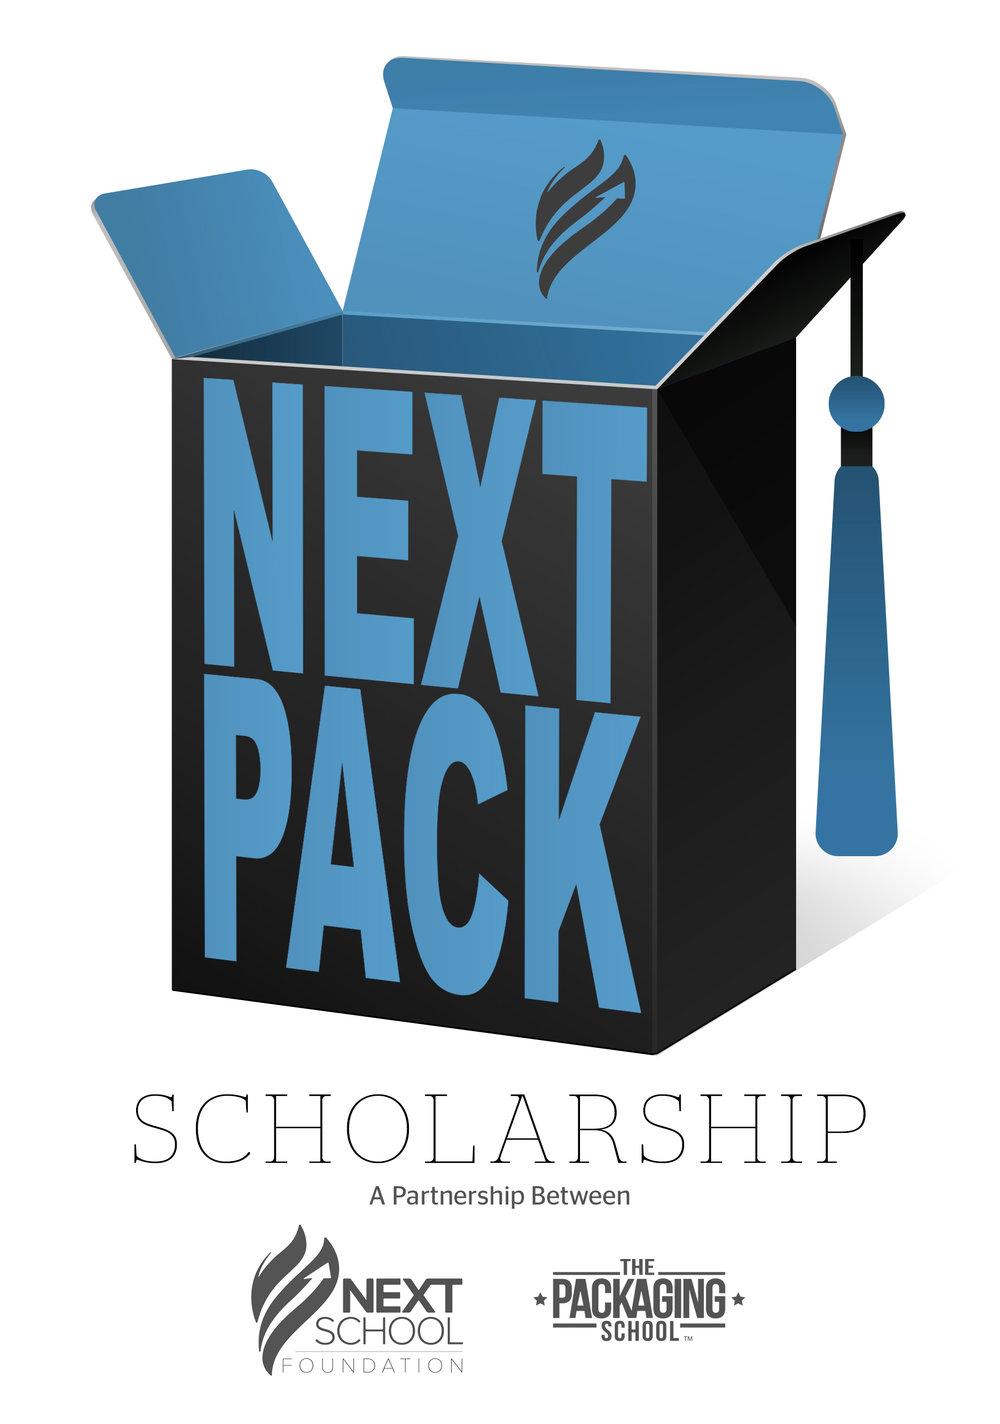 NEXT Pack Scholar LG vv4.jpg